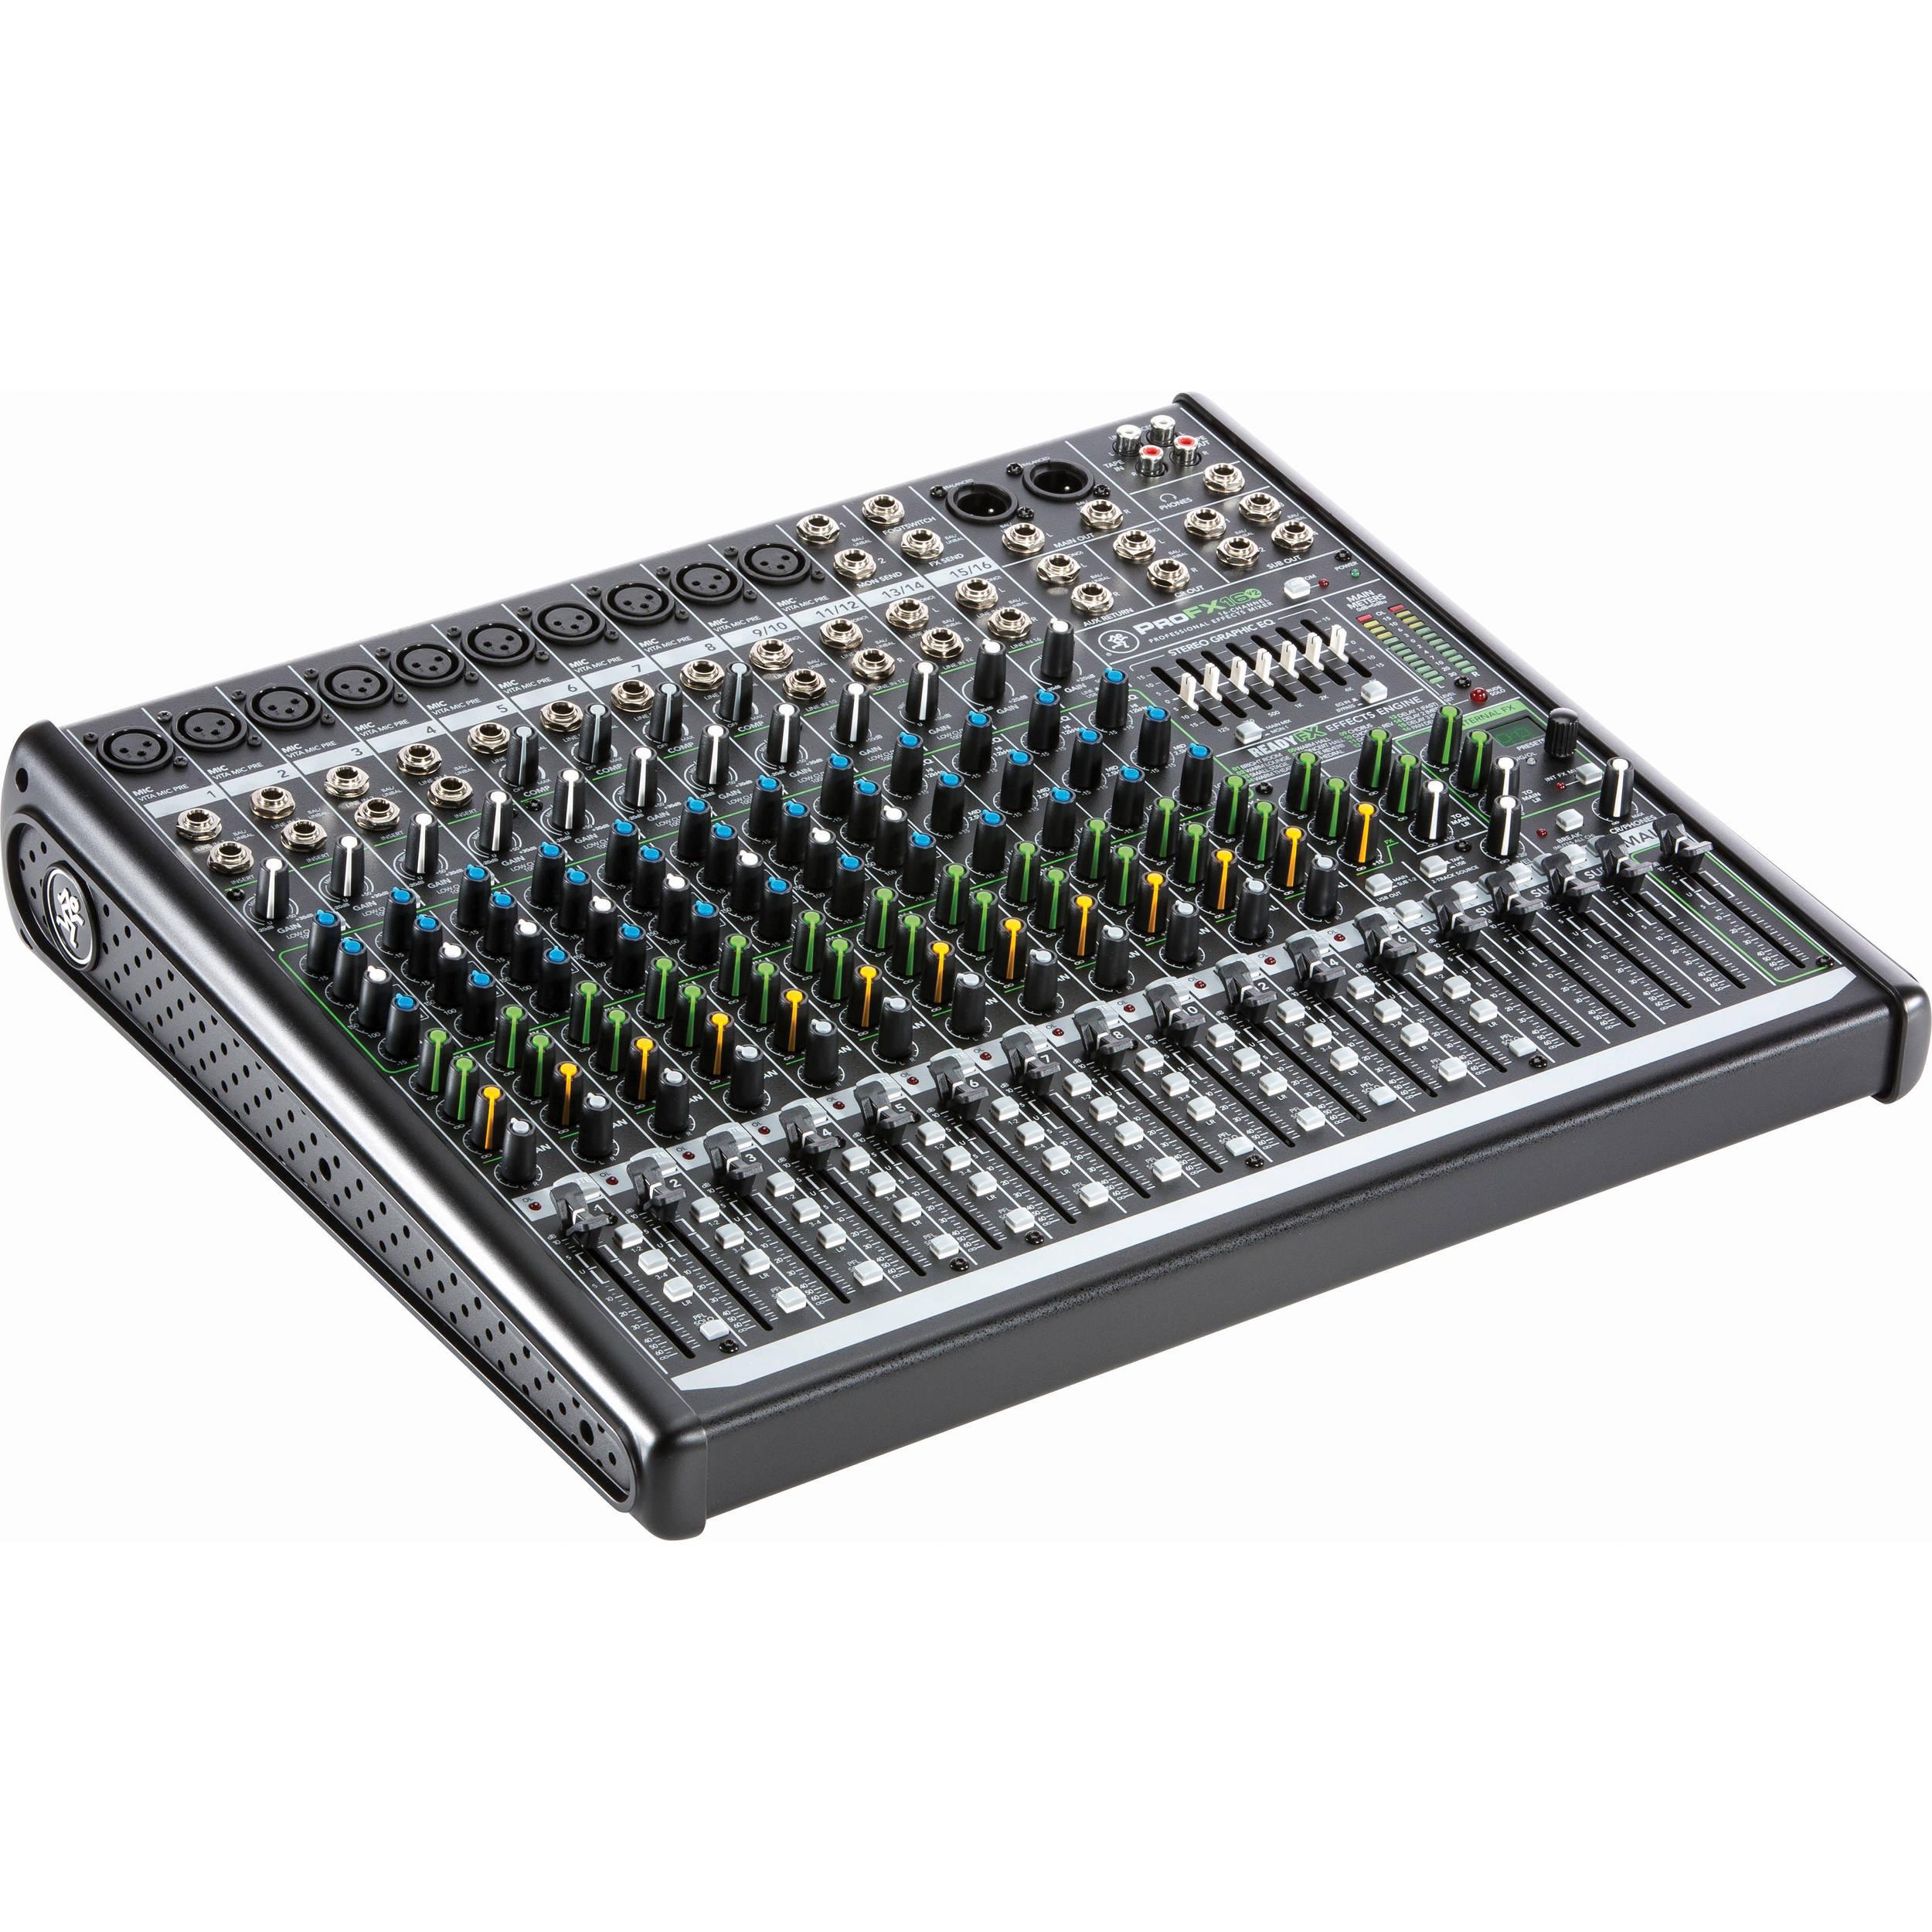 Mackie Profx16v2 16 Channel Sound Reinforcement Mixer